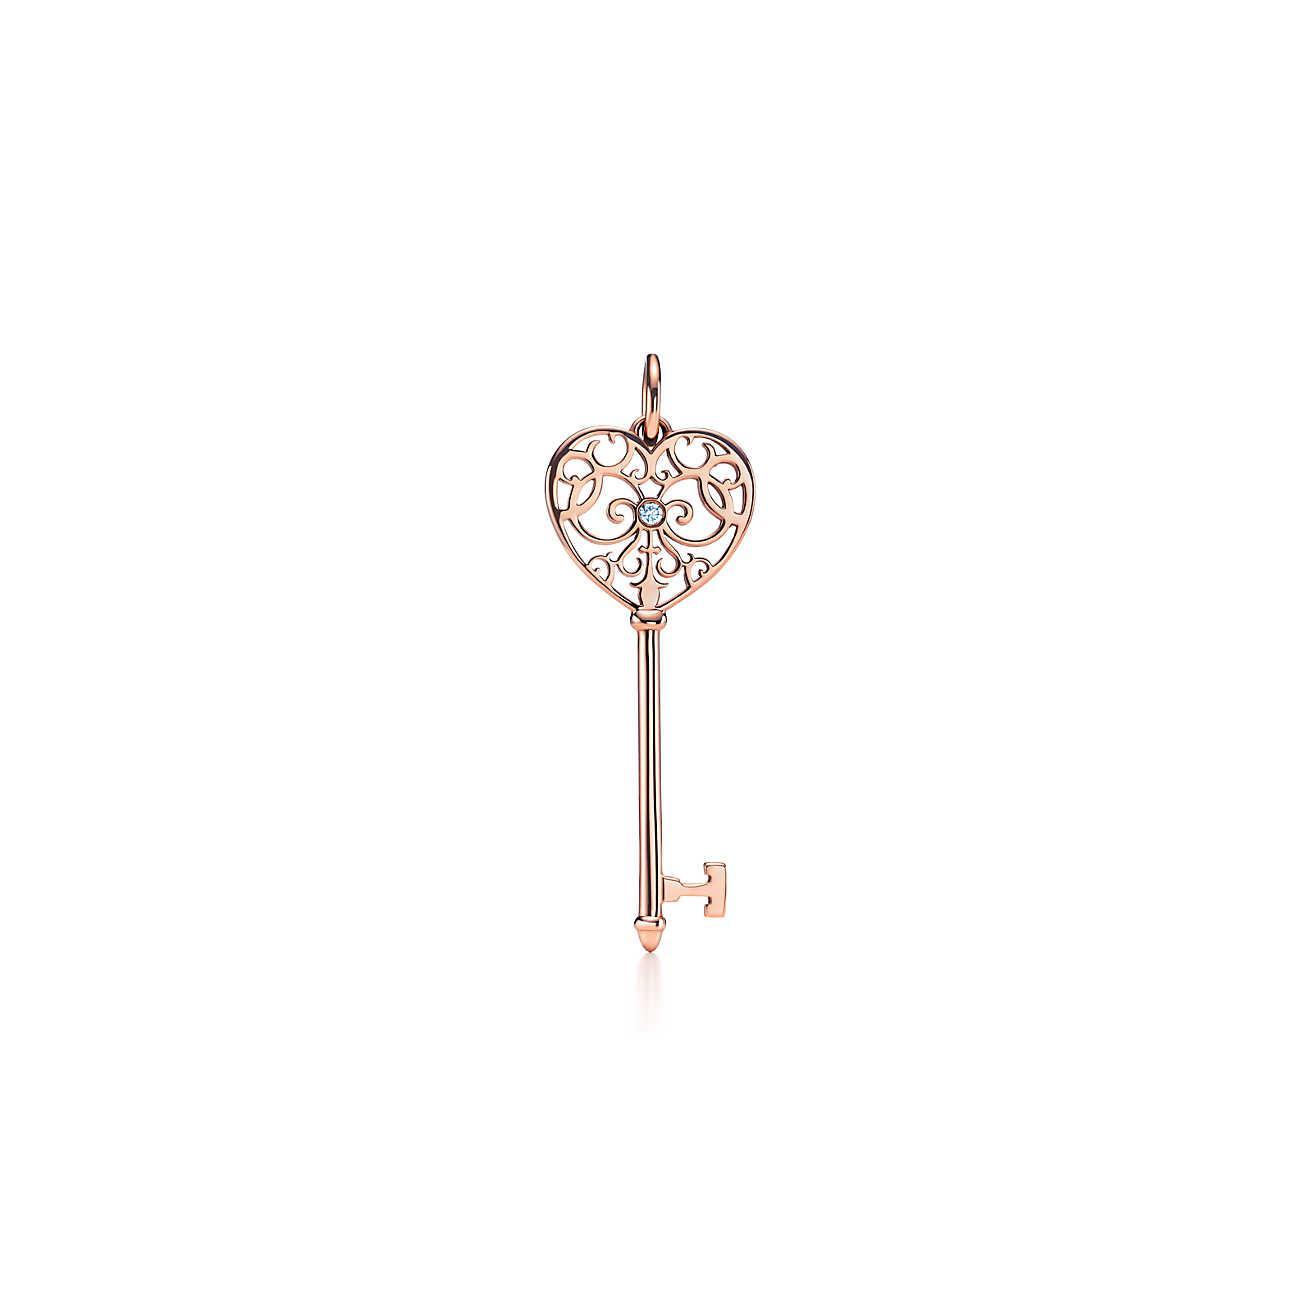 d2032d5dd Tiffany & Co. Tiffany Keys Enchant Key Pendant In 18k Rose Gold With ...